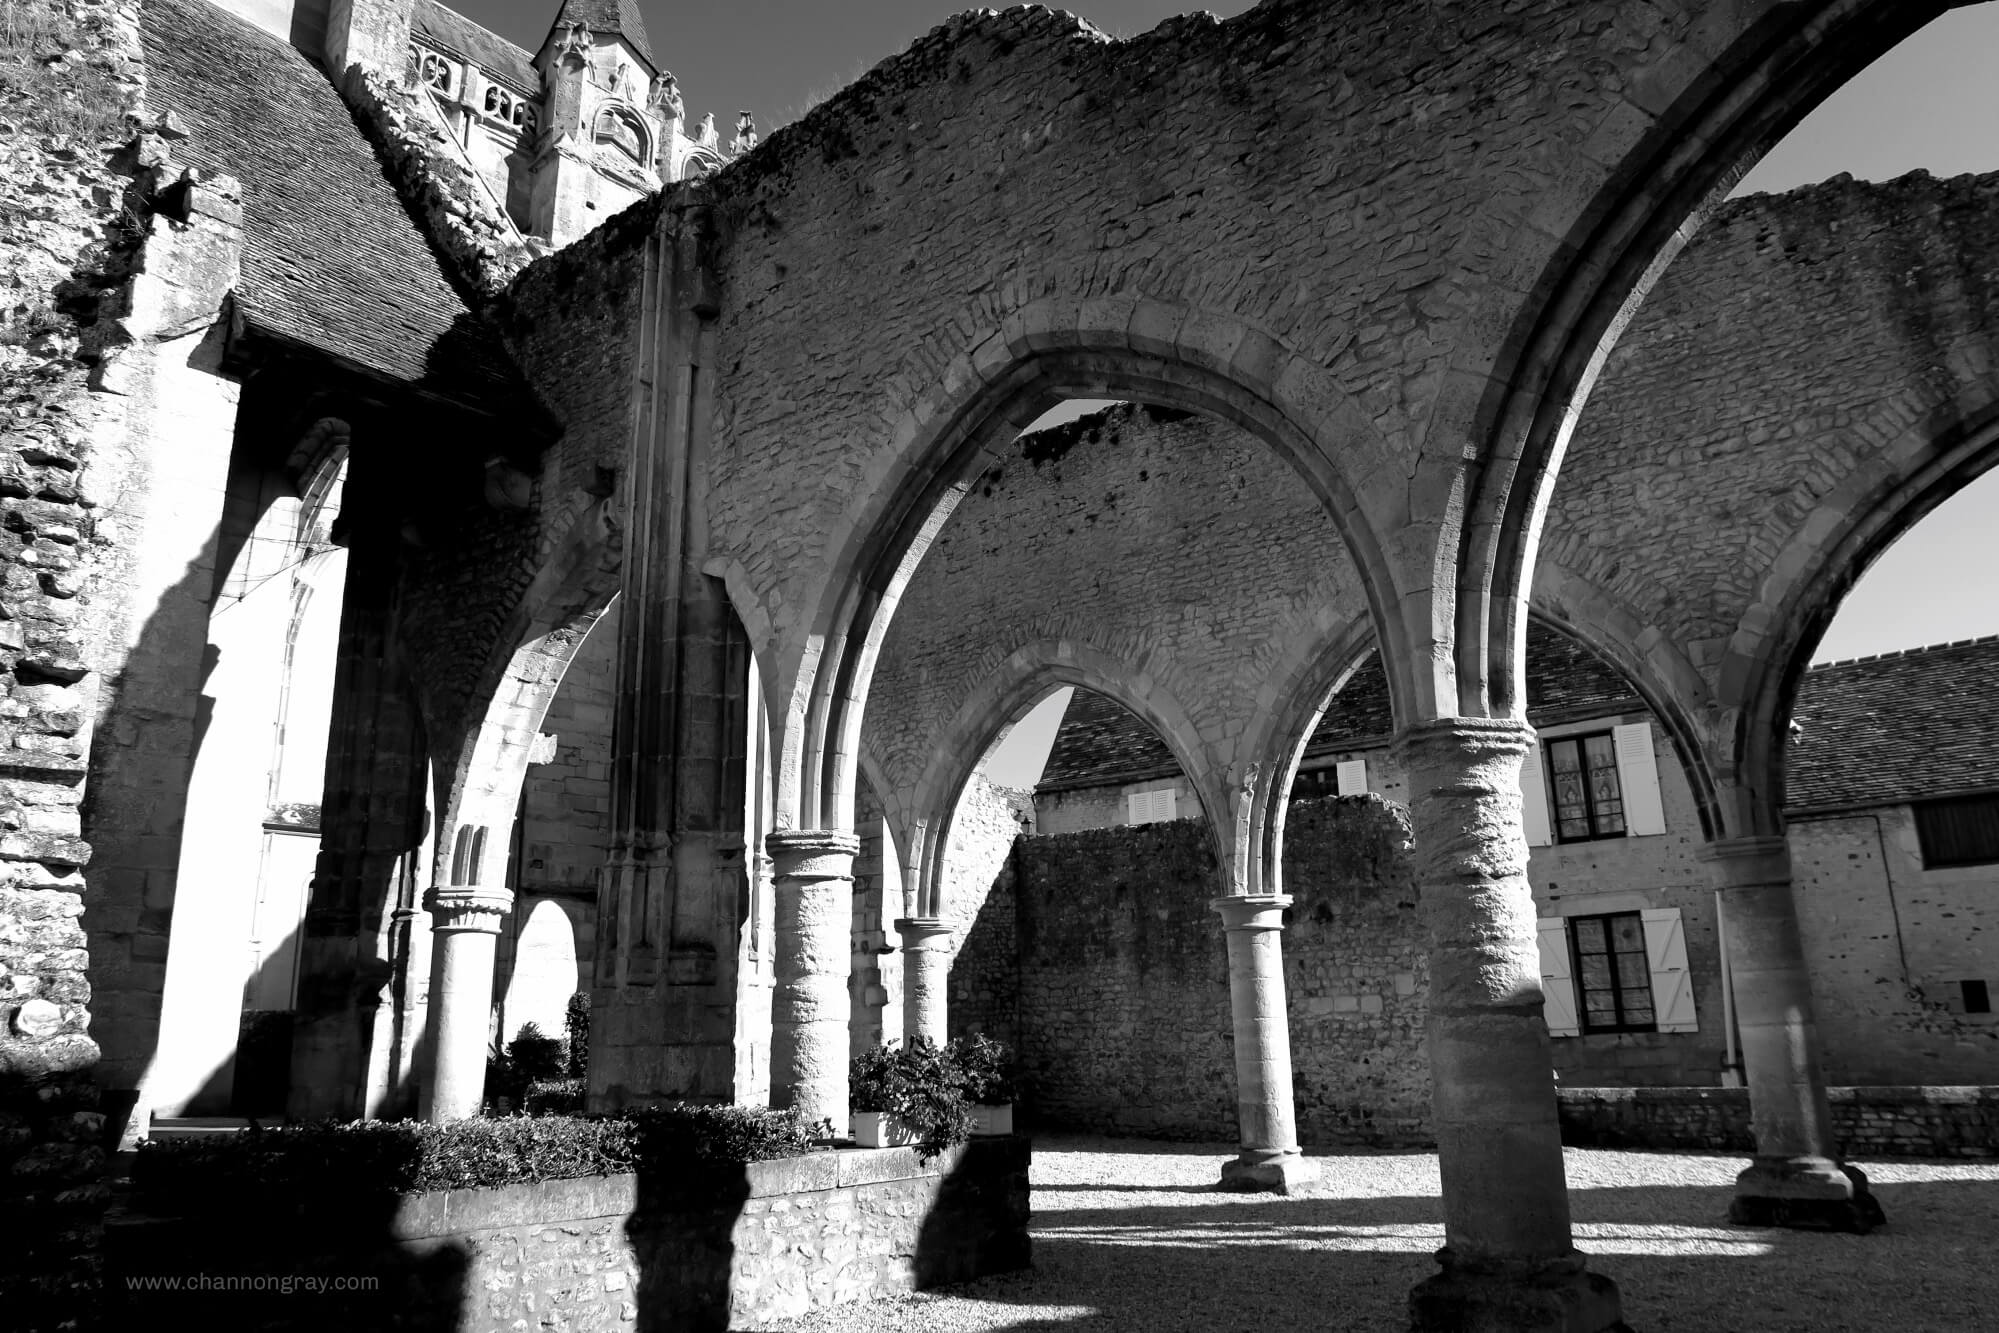 Church Ruins in Ecouche